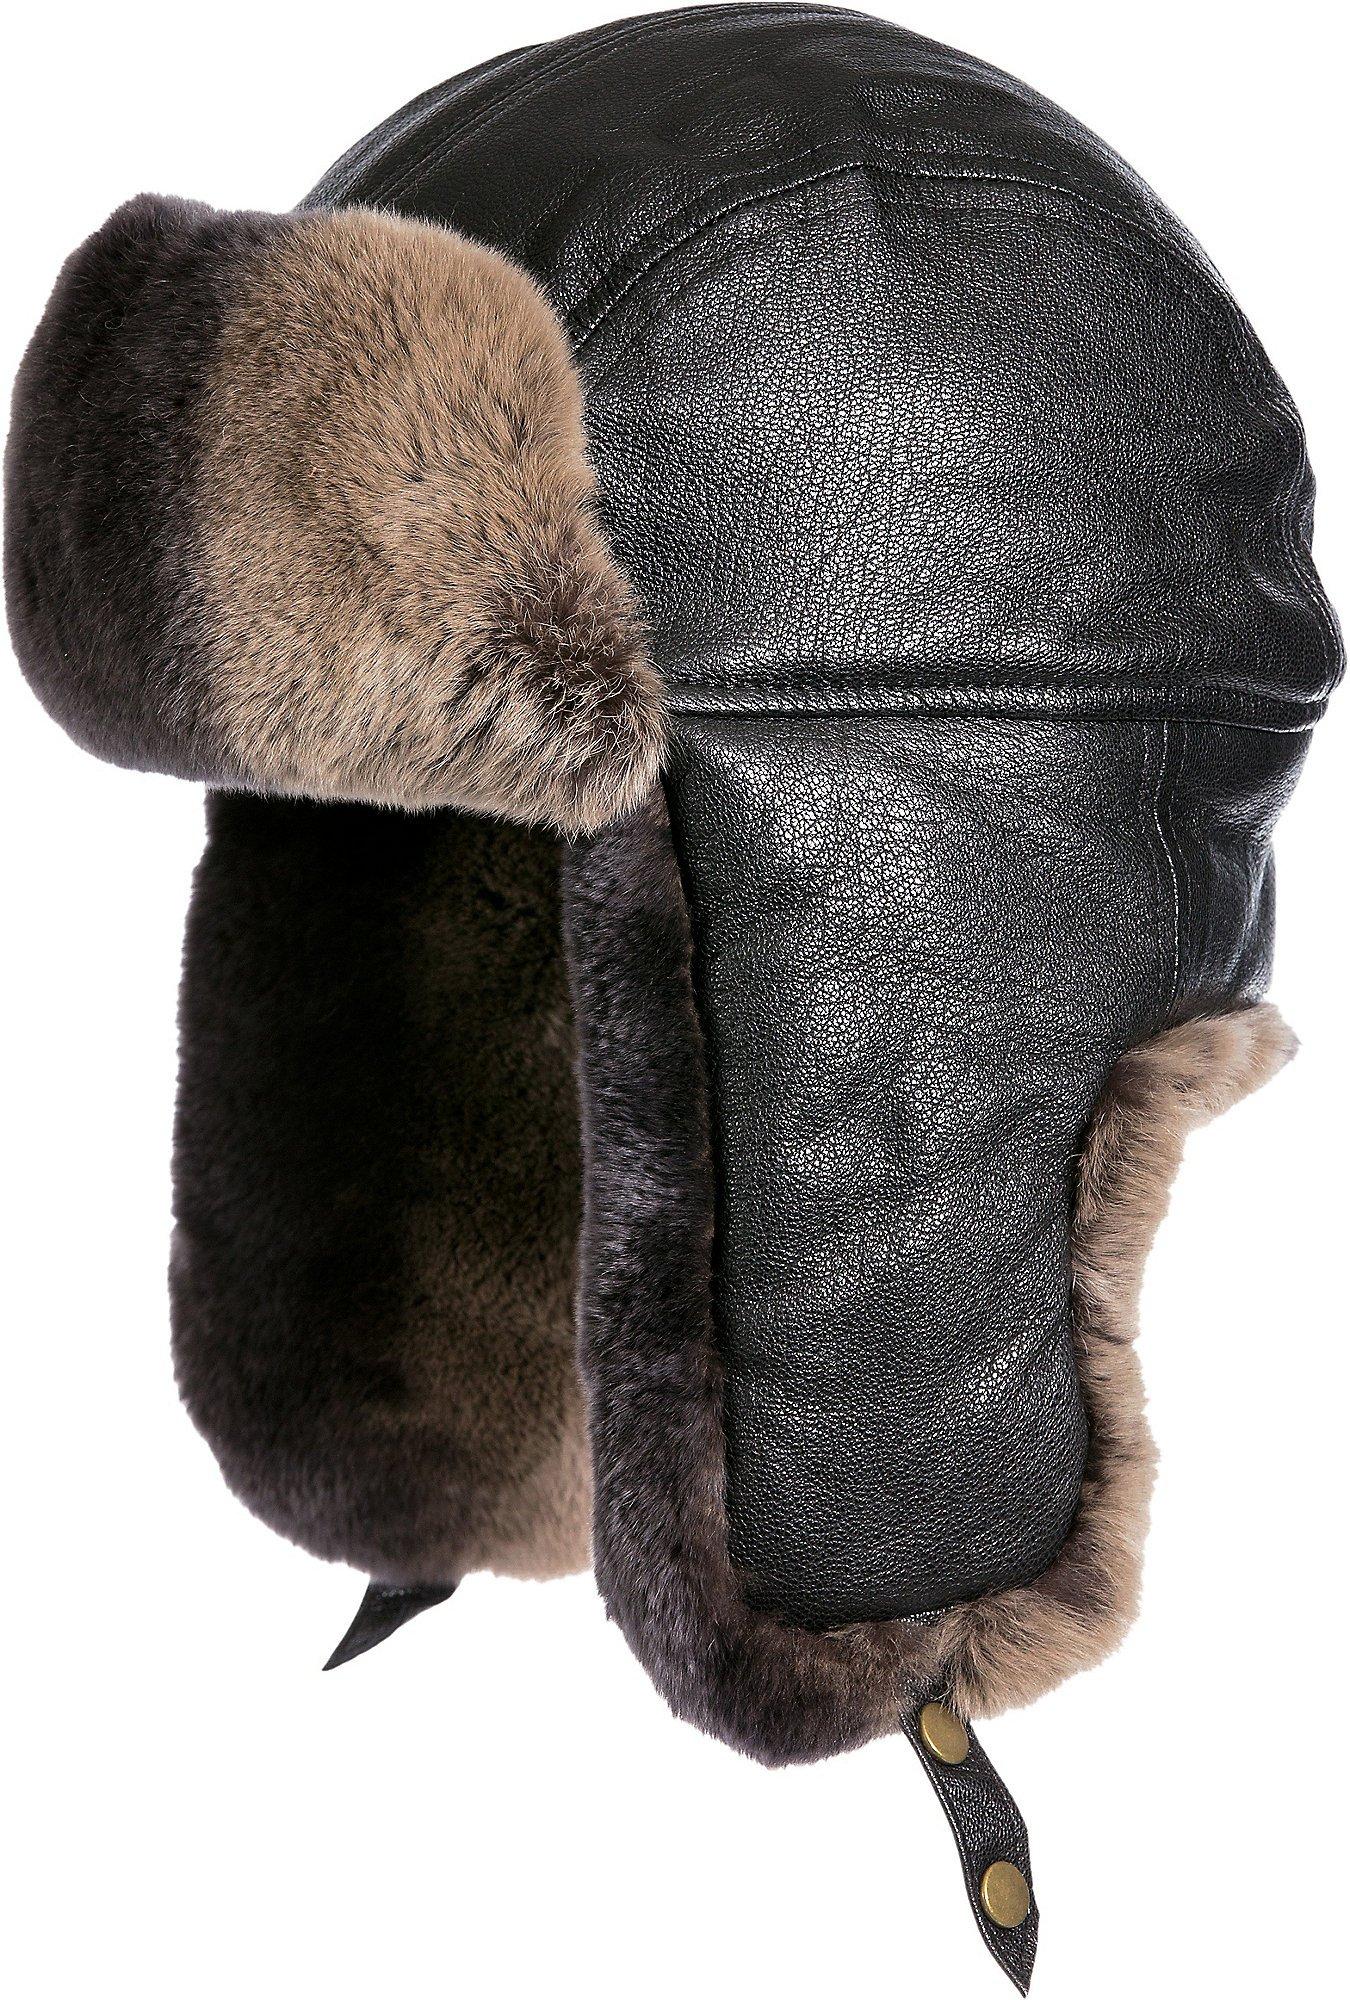 Lambskin Leather Trapper Hat with 2-Tone Rabbit Fur Trim, Black/Brown, Size XLarge (7 1/2–7 5/8)